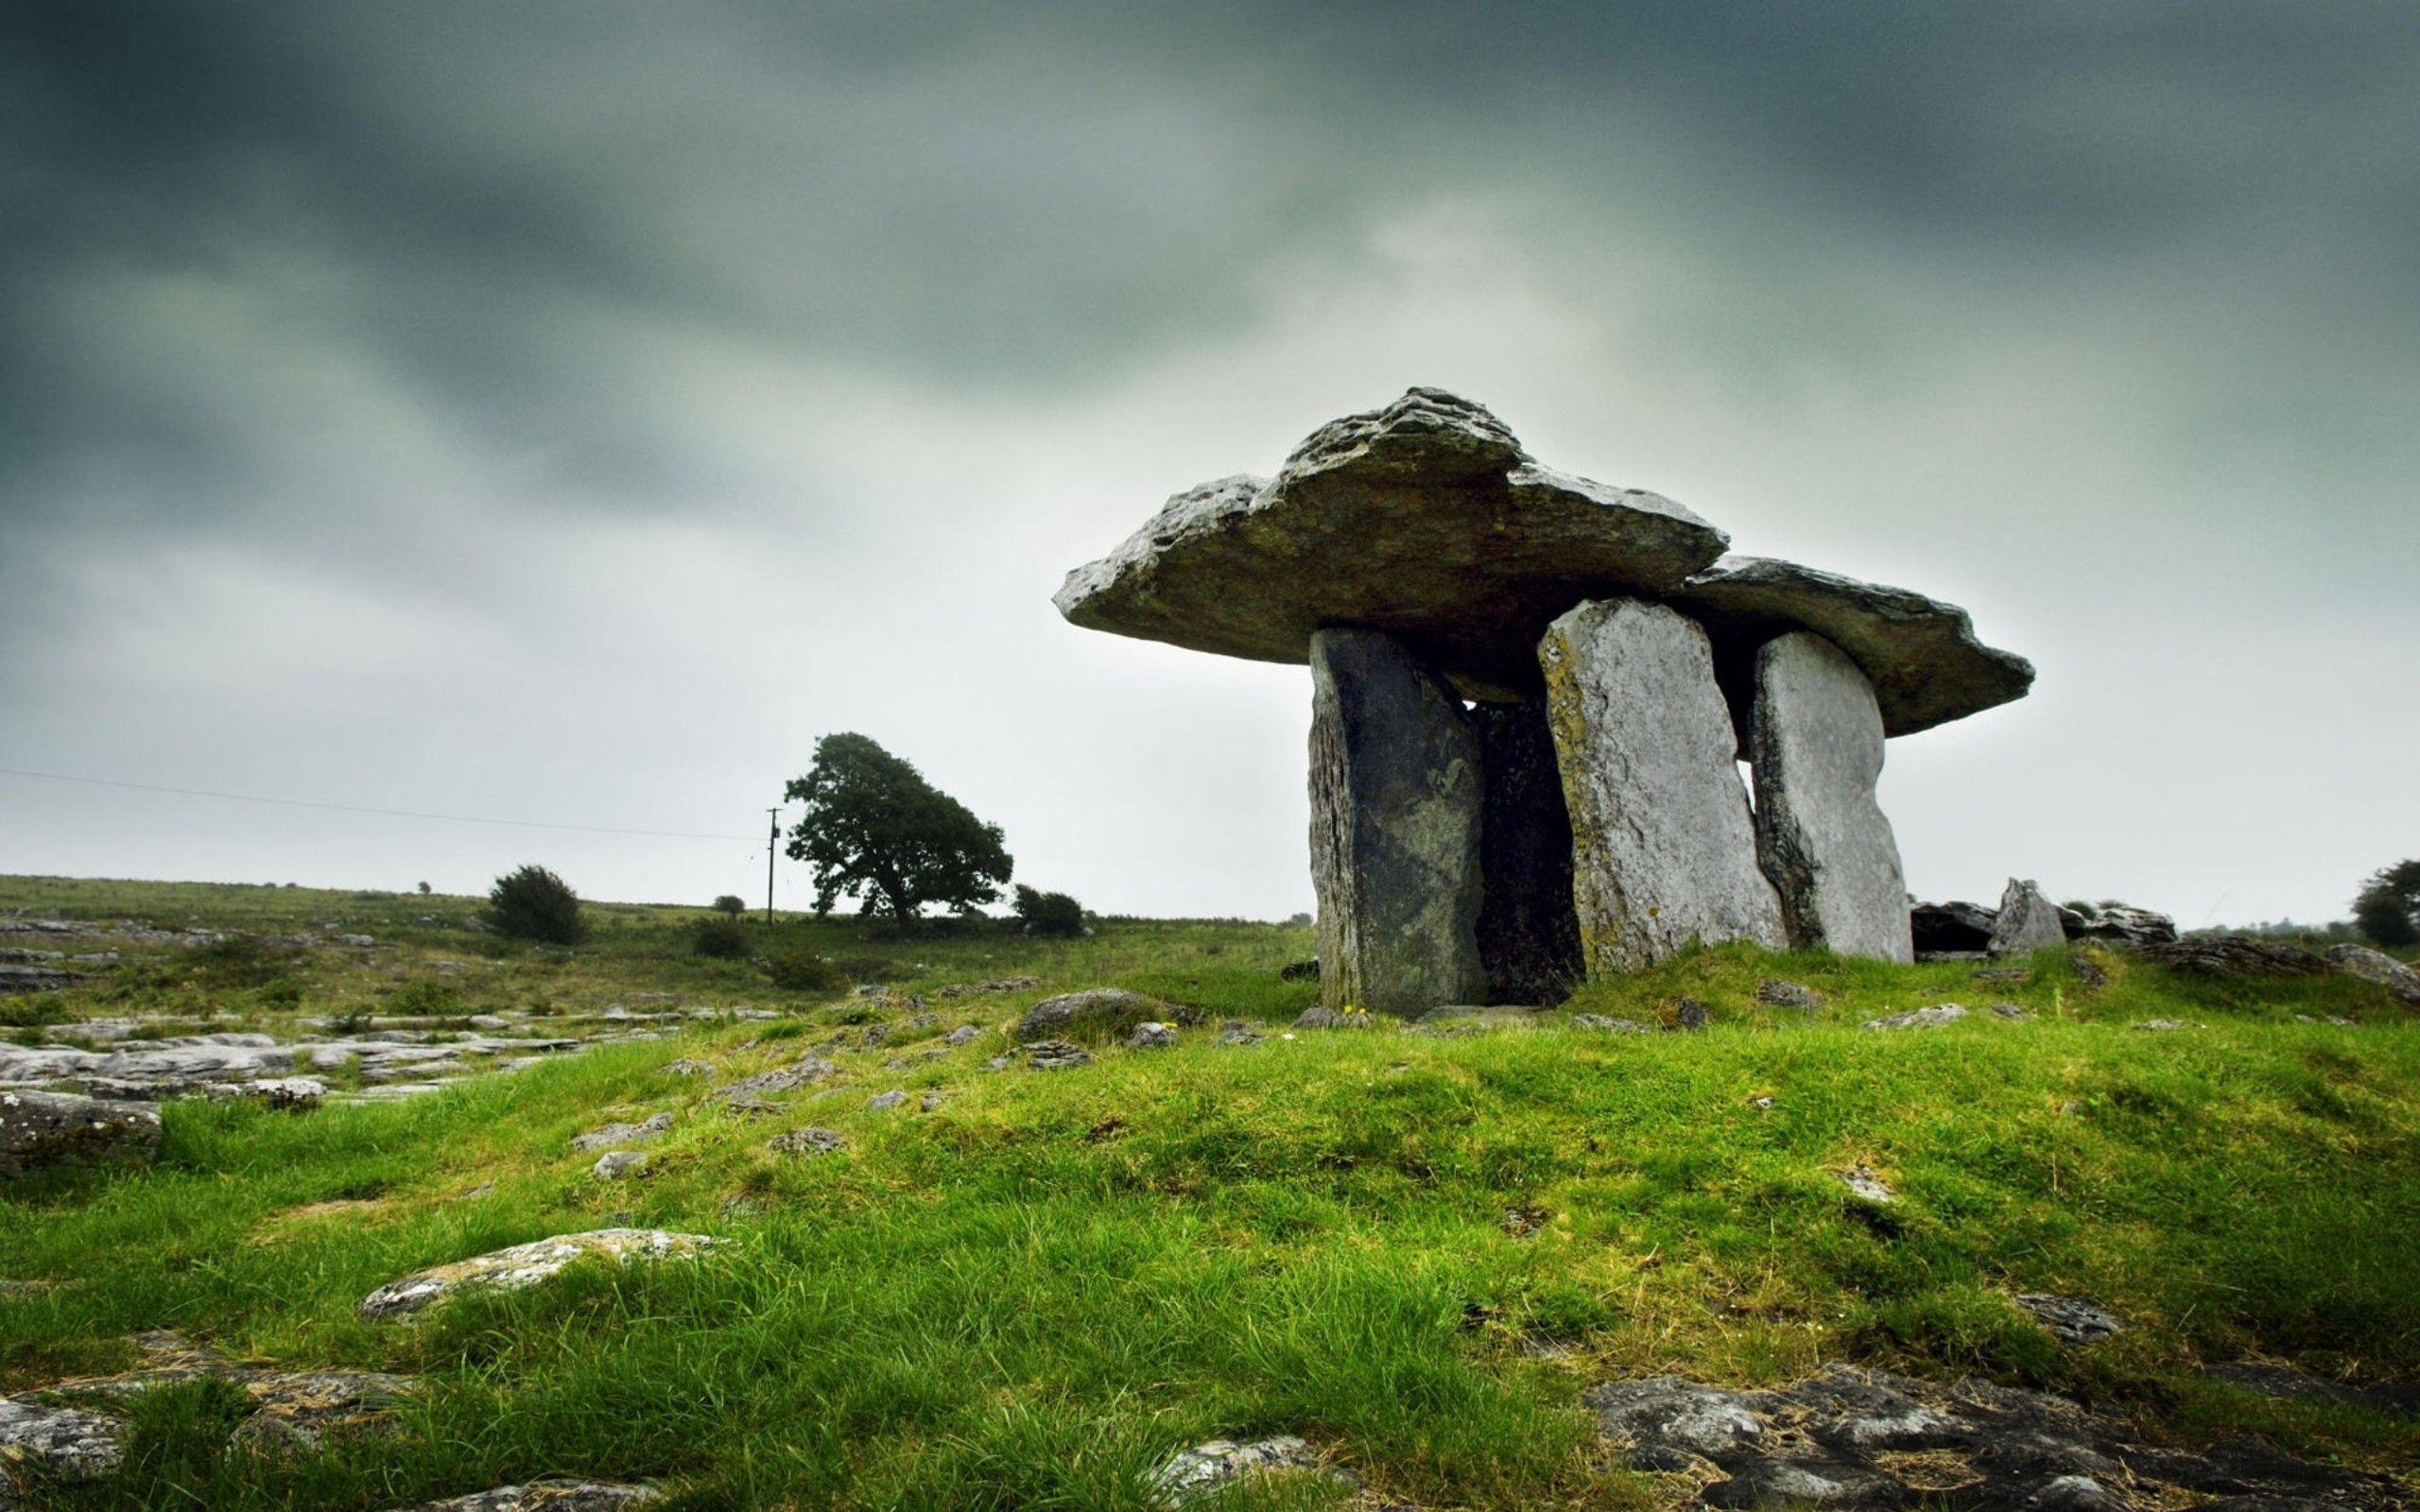 Magical Ireland Desktop Wallpapers Top Free Magical Ireland Desktop Backgrounds Wallpaperaccess